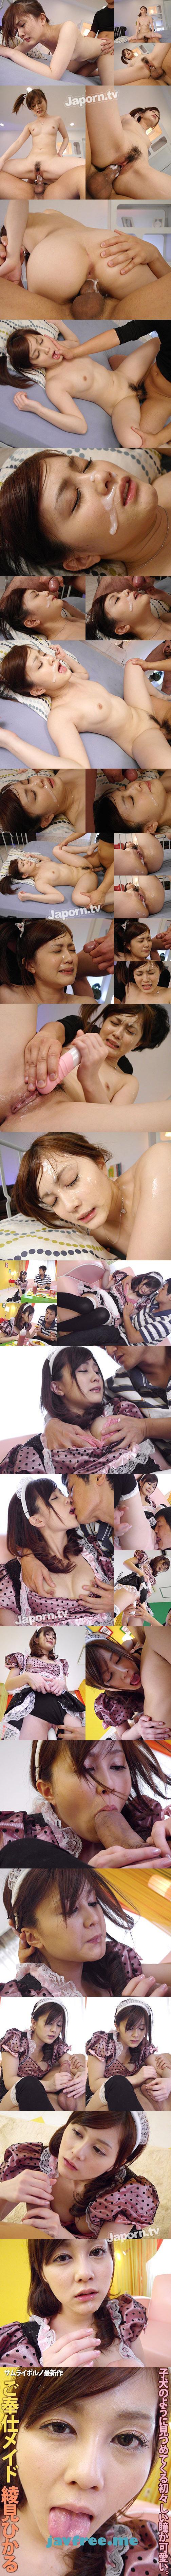 [DSAM 27] ご奉仕メイド : 綾見ひかる 綾見ひかる Hikaru Ayami DSAM